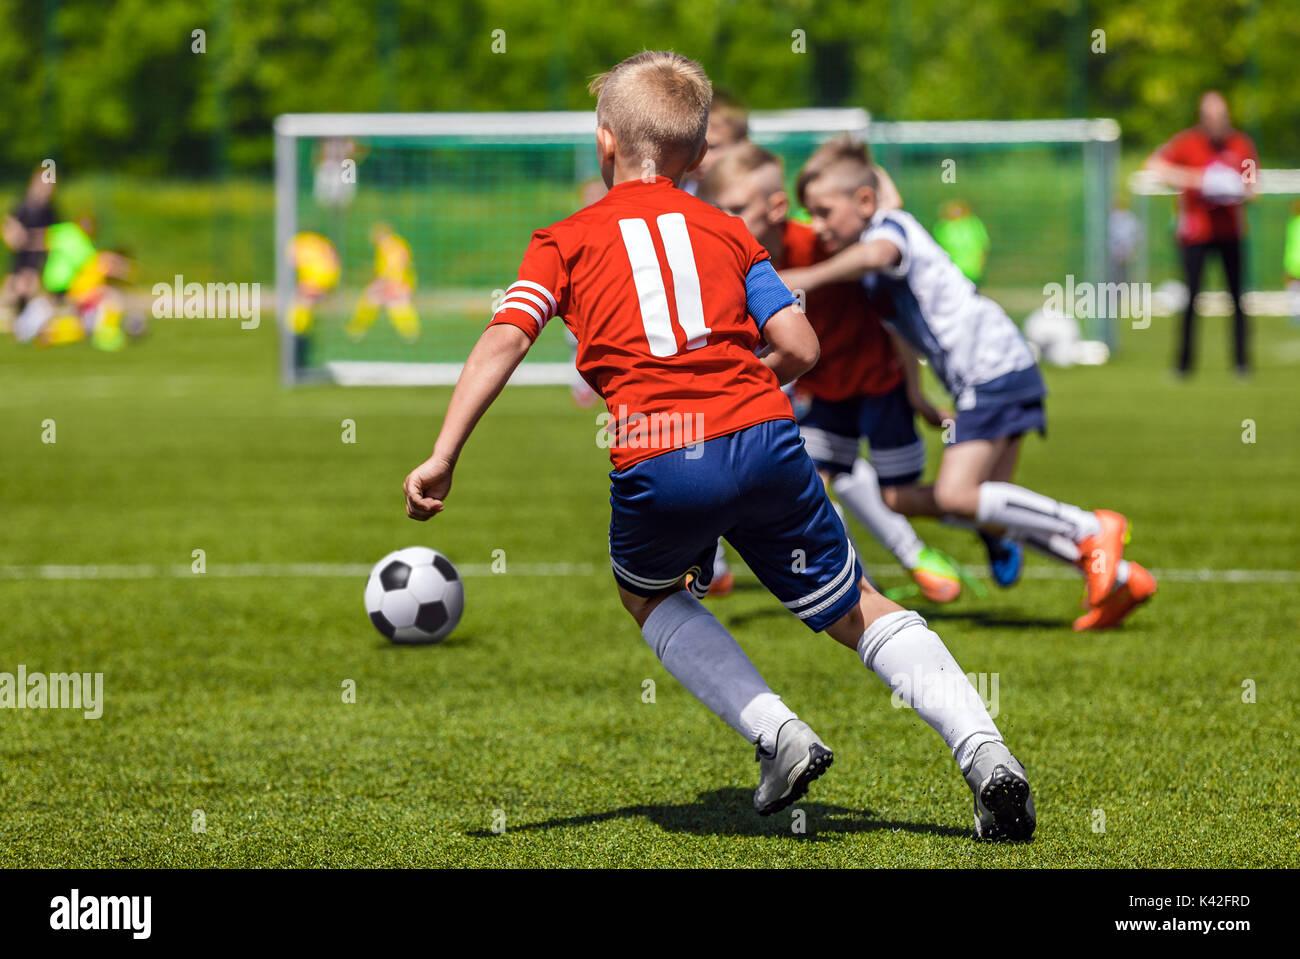 Fussball Spiele FГјr Kinder